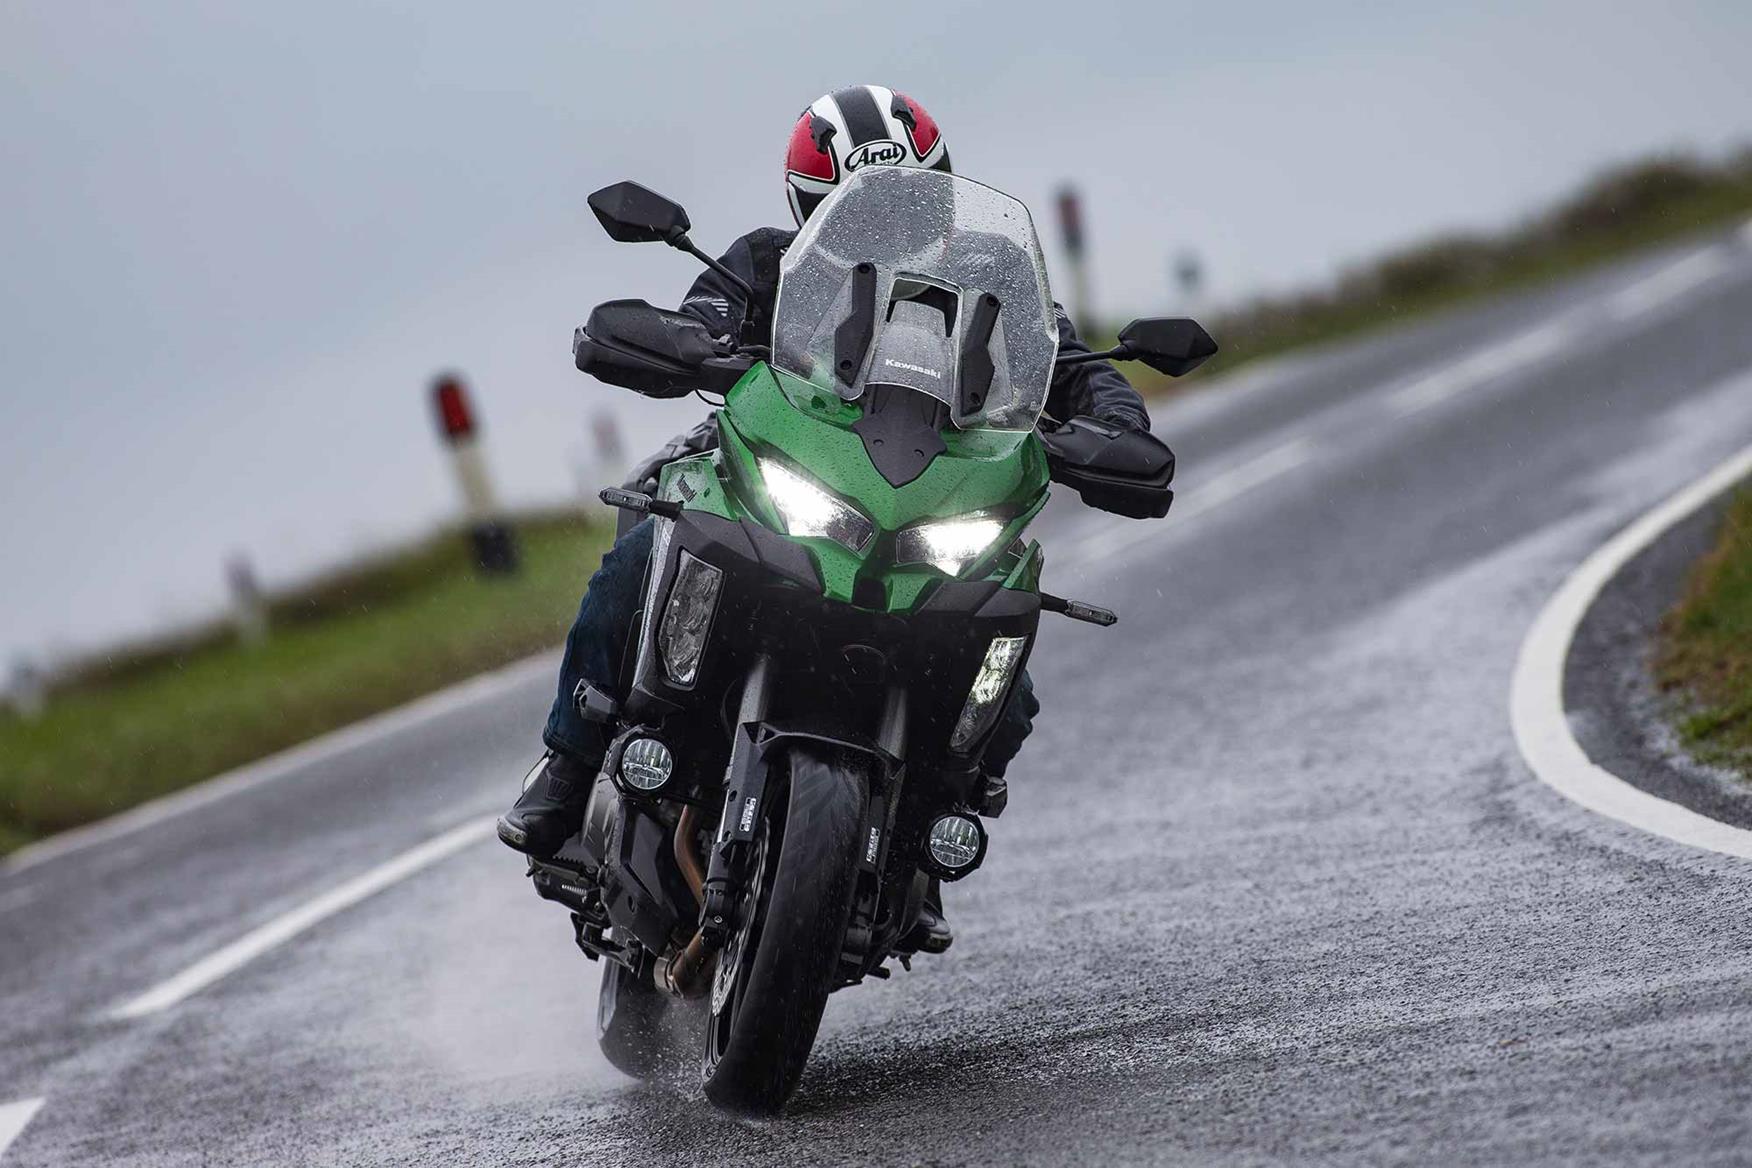 Cornering on the Kawasaki Versys 1000 SE